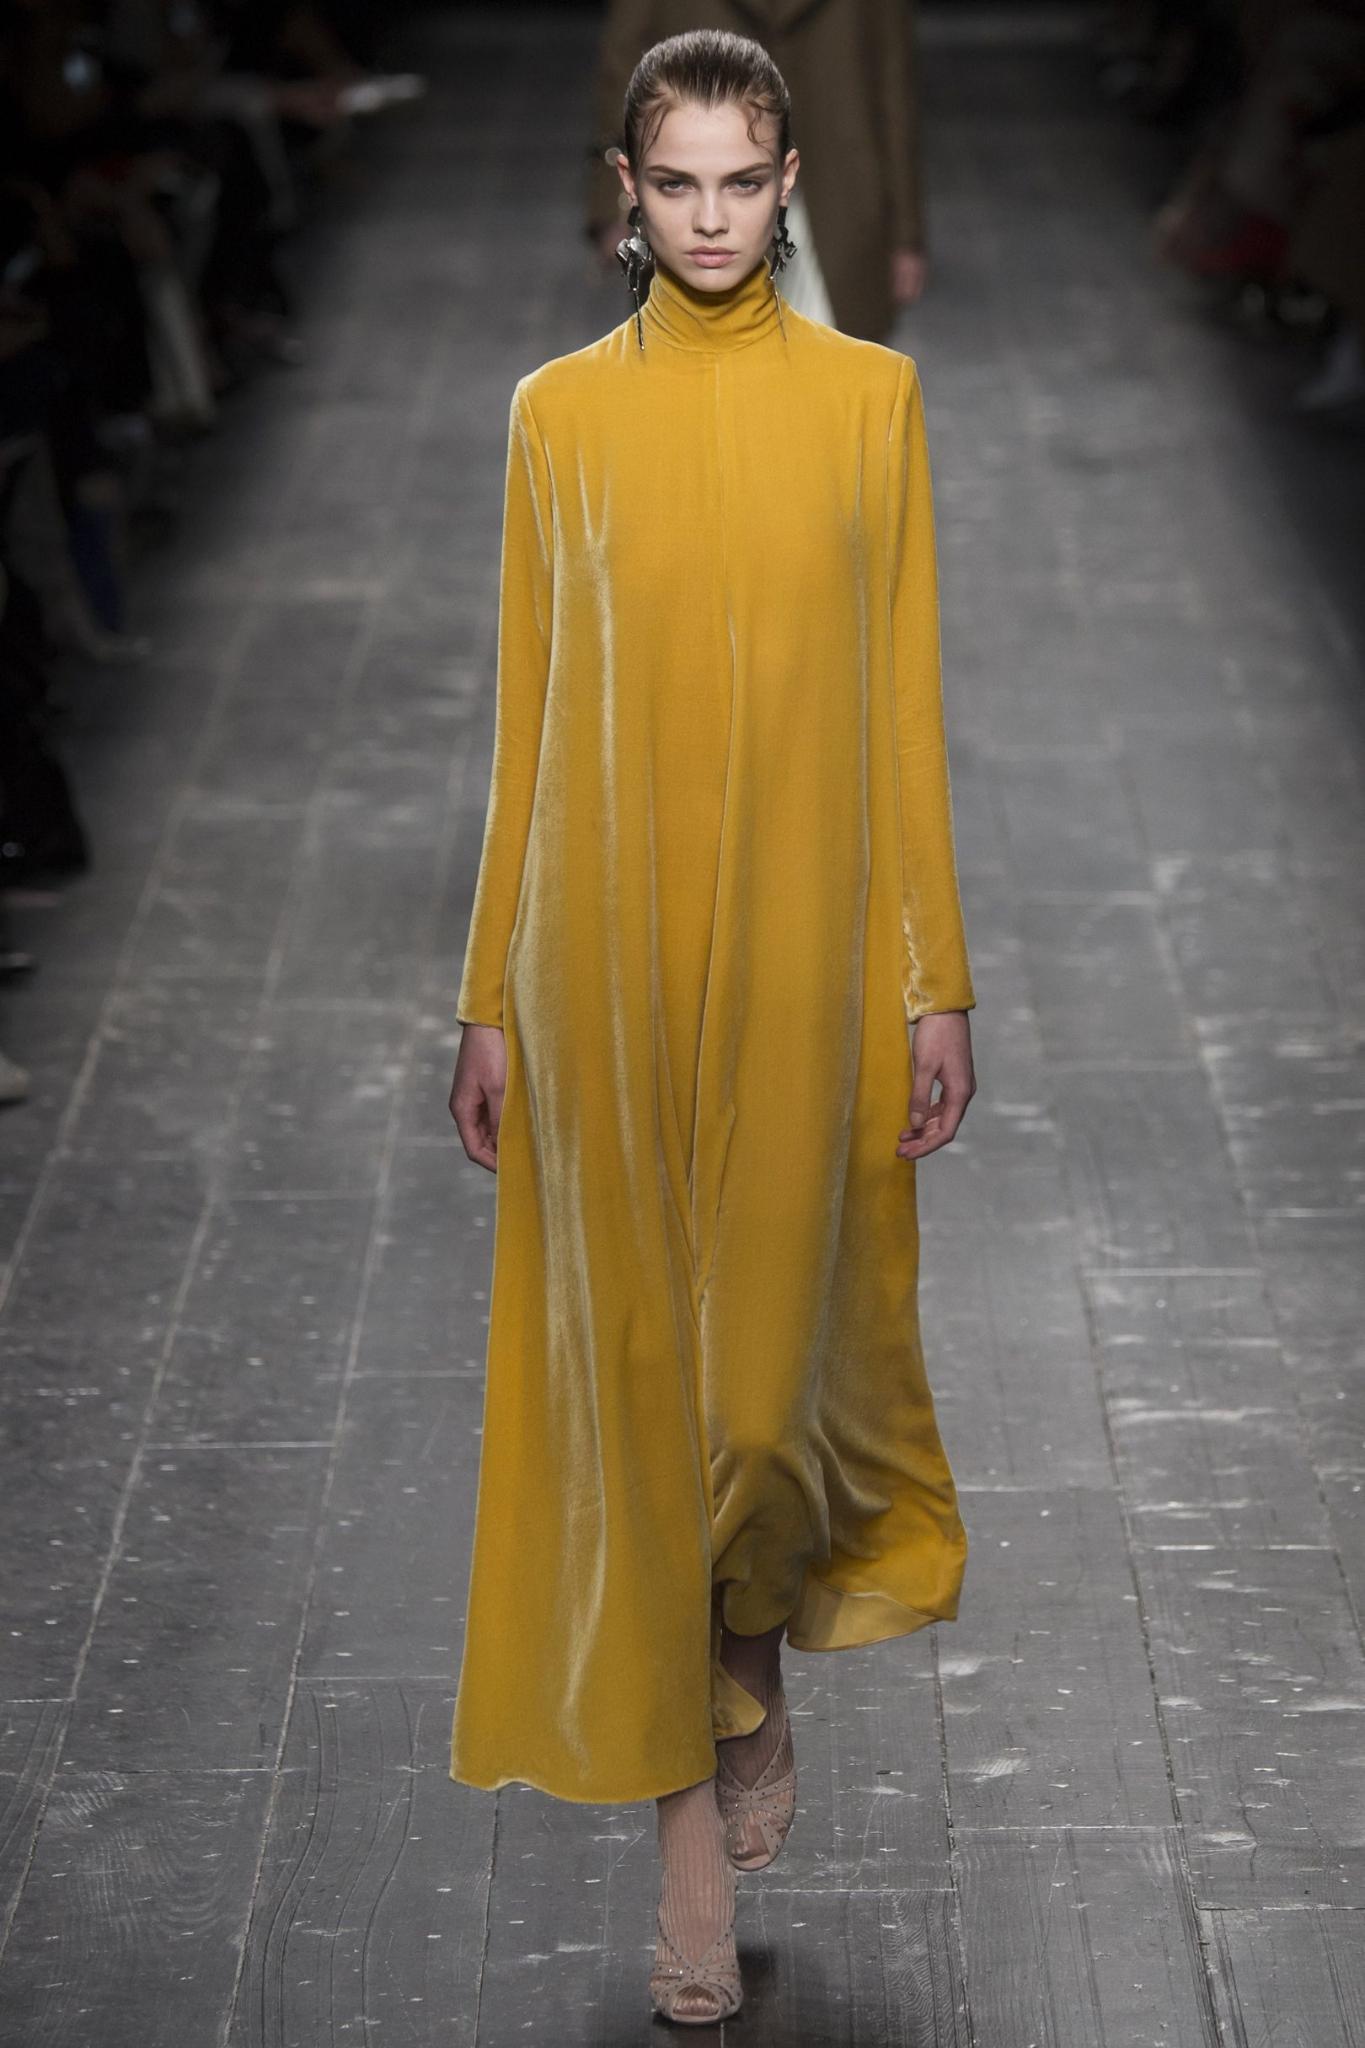 MOD-by-Monique-Fashion-Trend-Velvet-Valentino